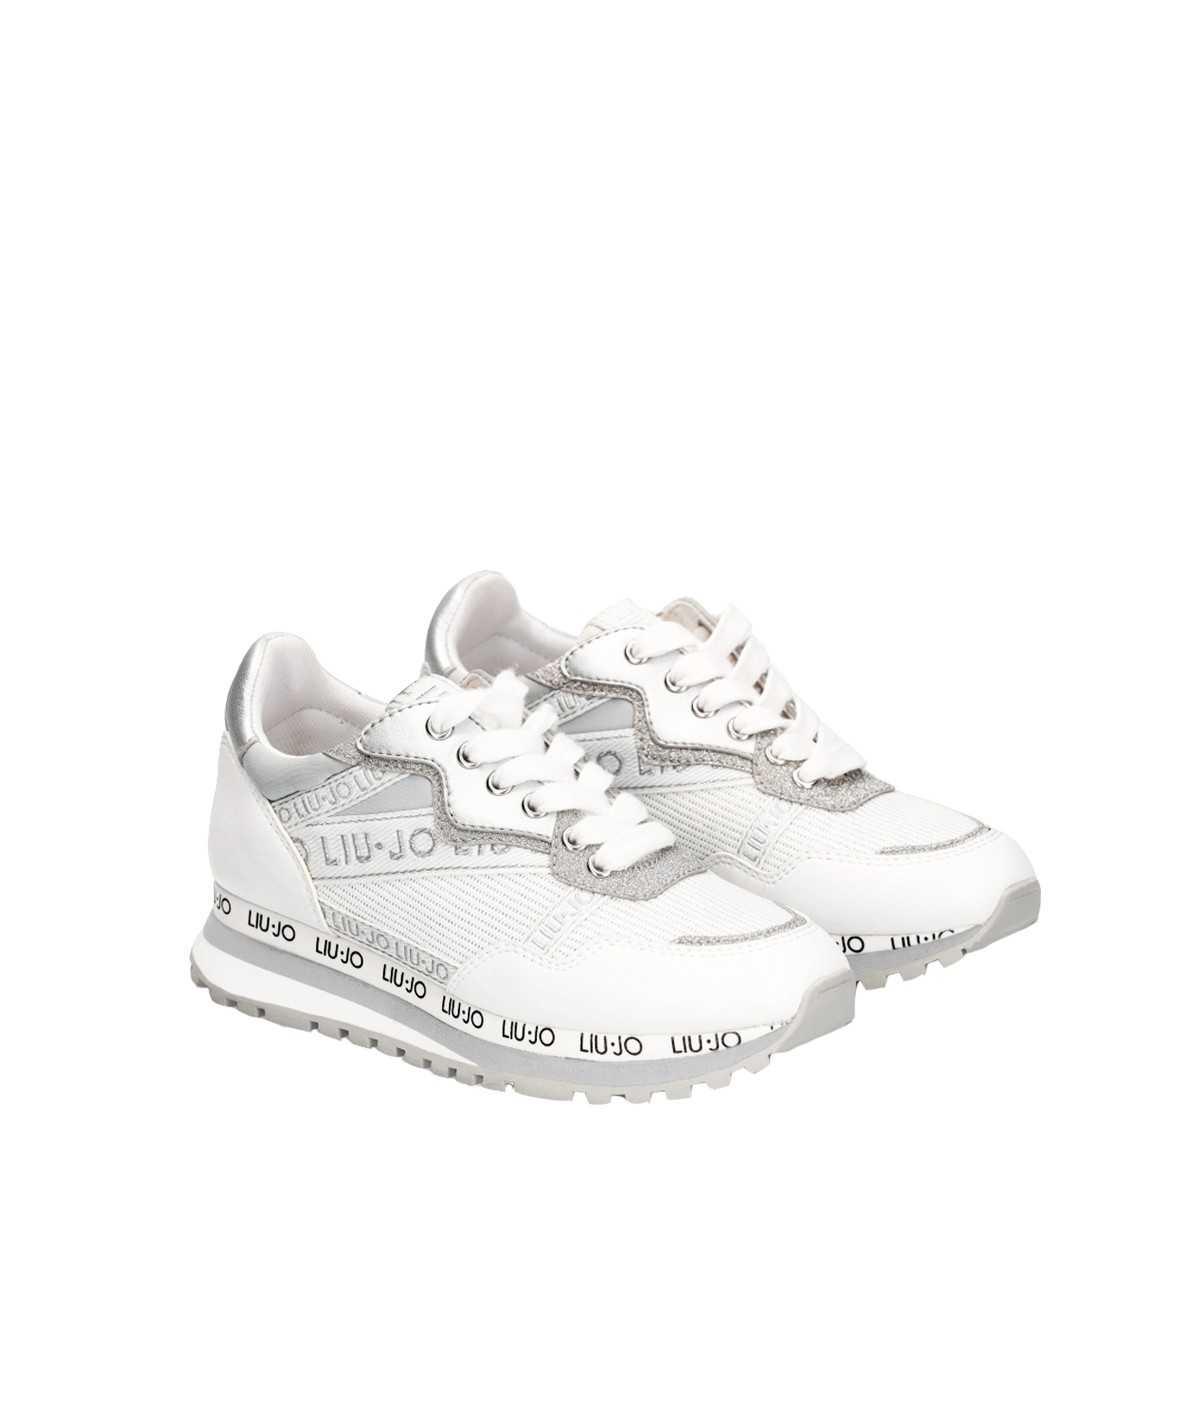 LIU JO Sneakers Bambina 29/34